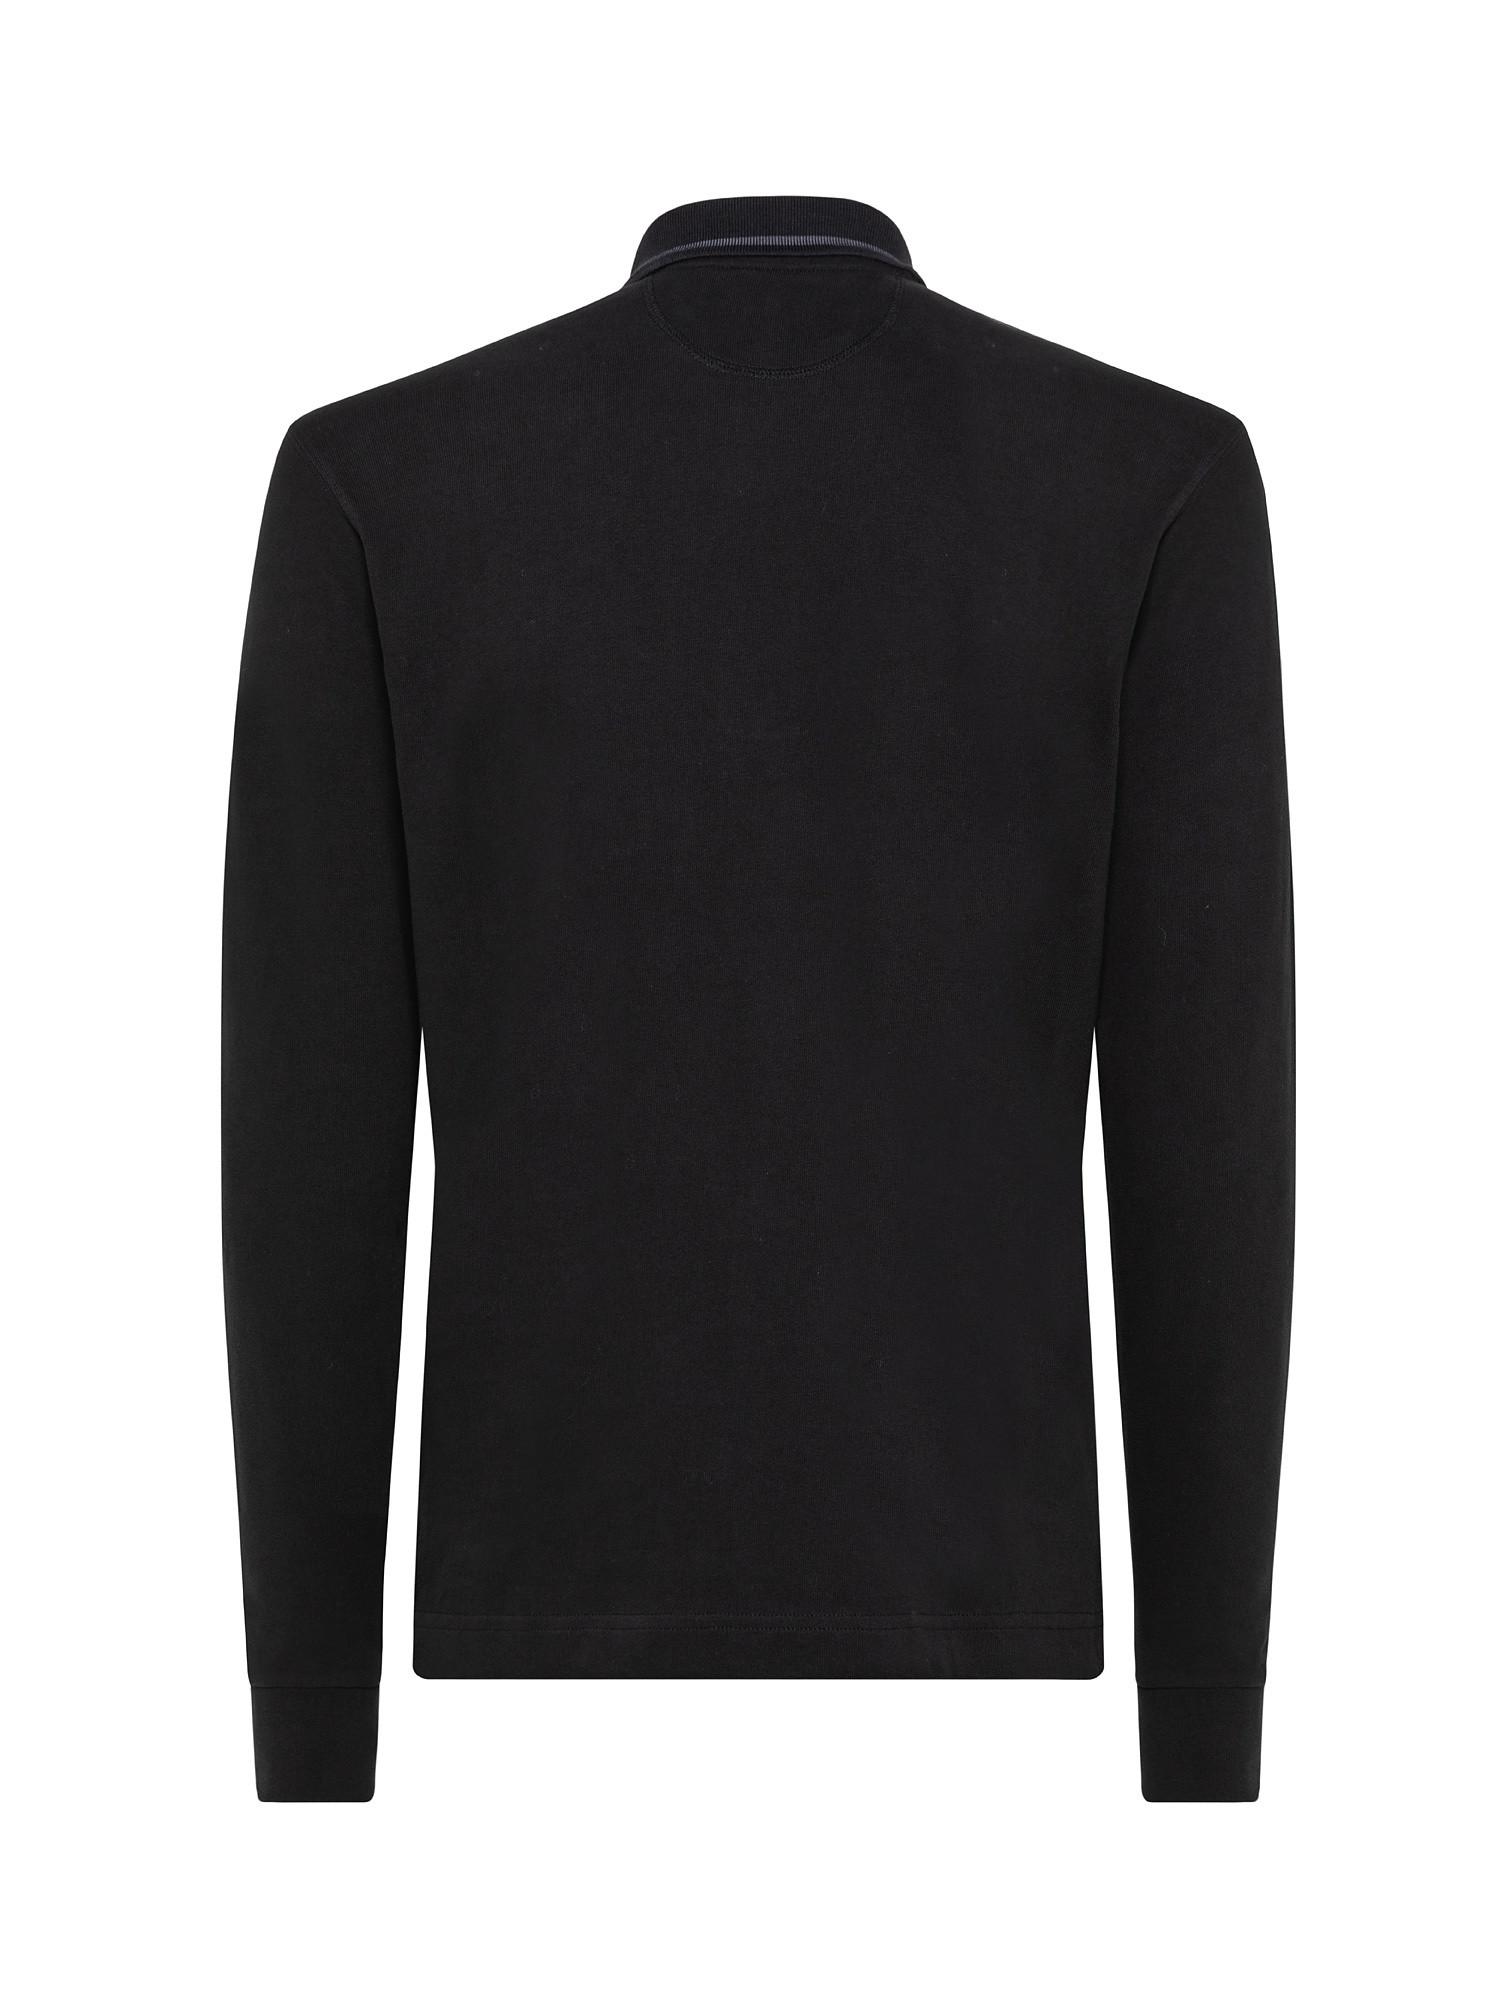 Polo uomo a maniche lunghe in cotone, Nero, large image number 1